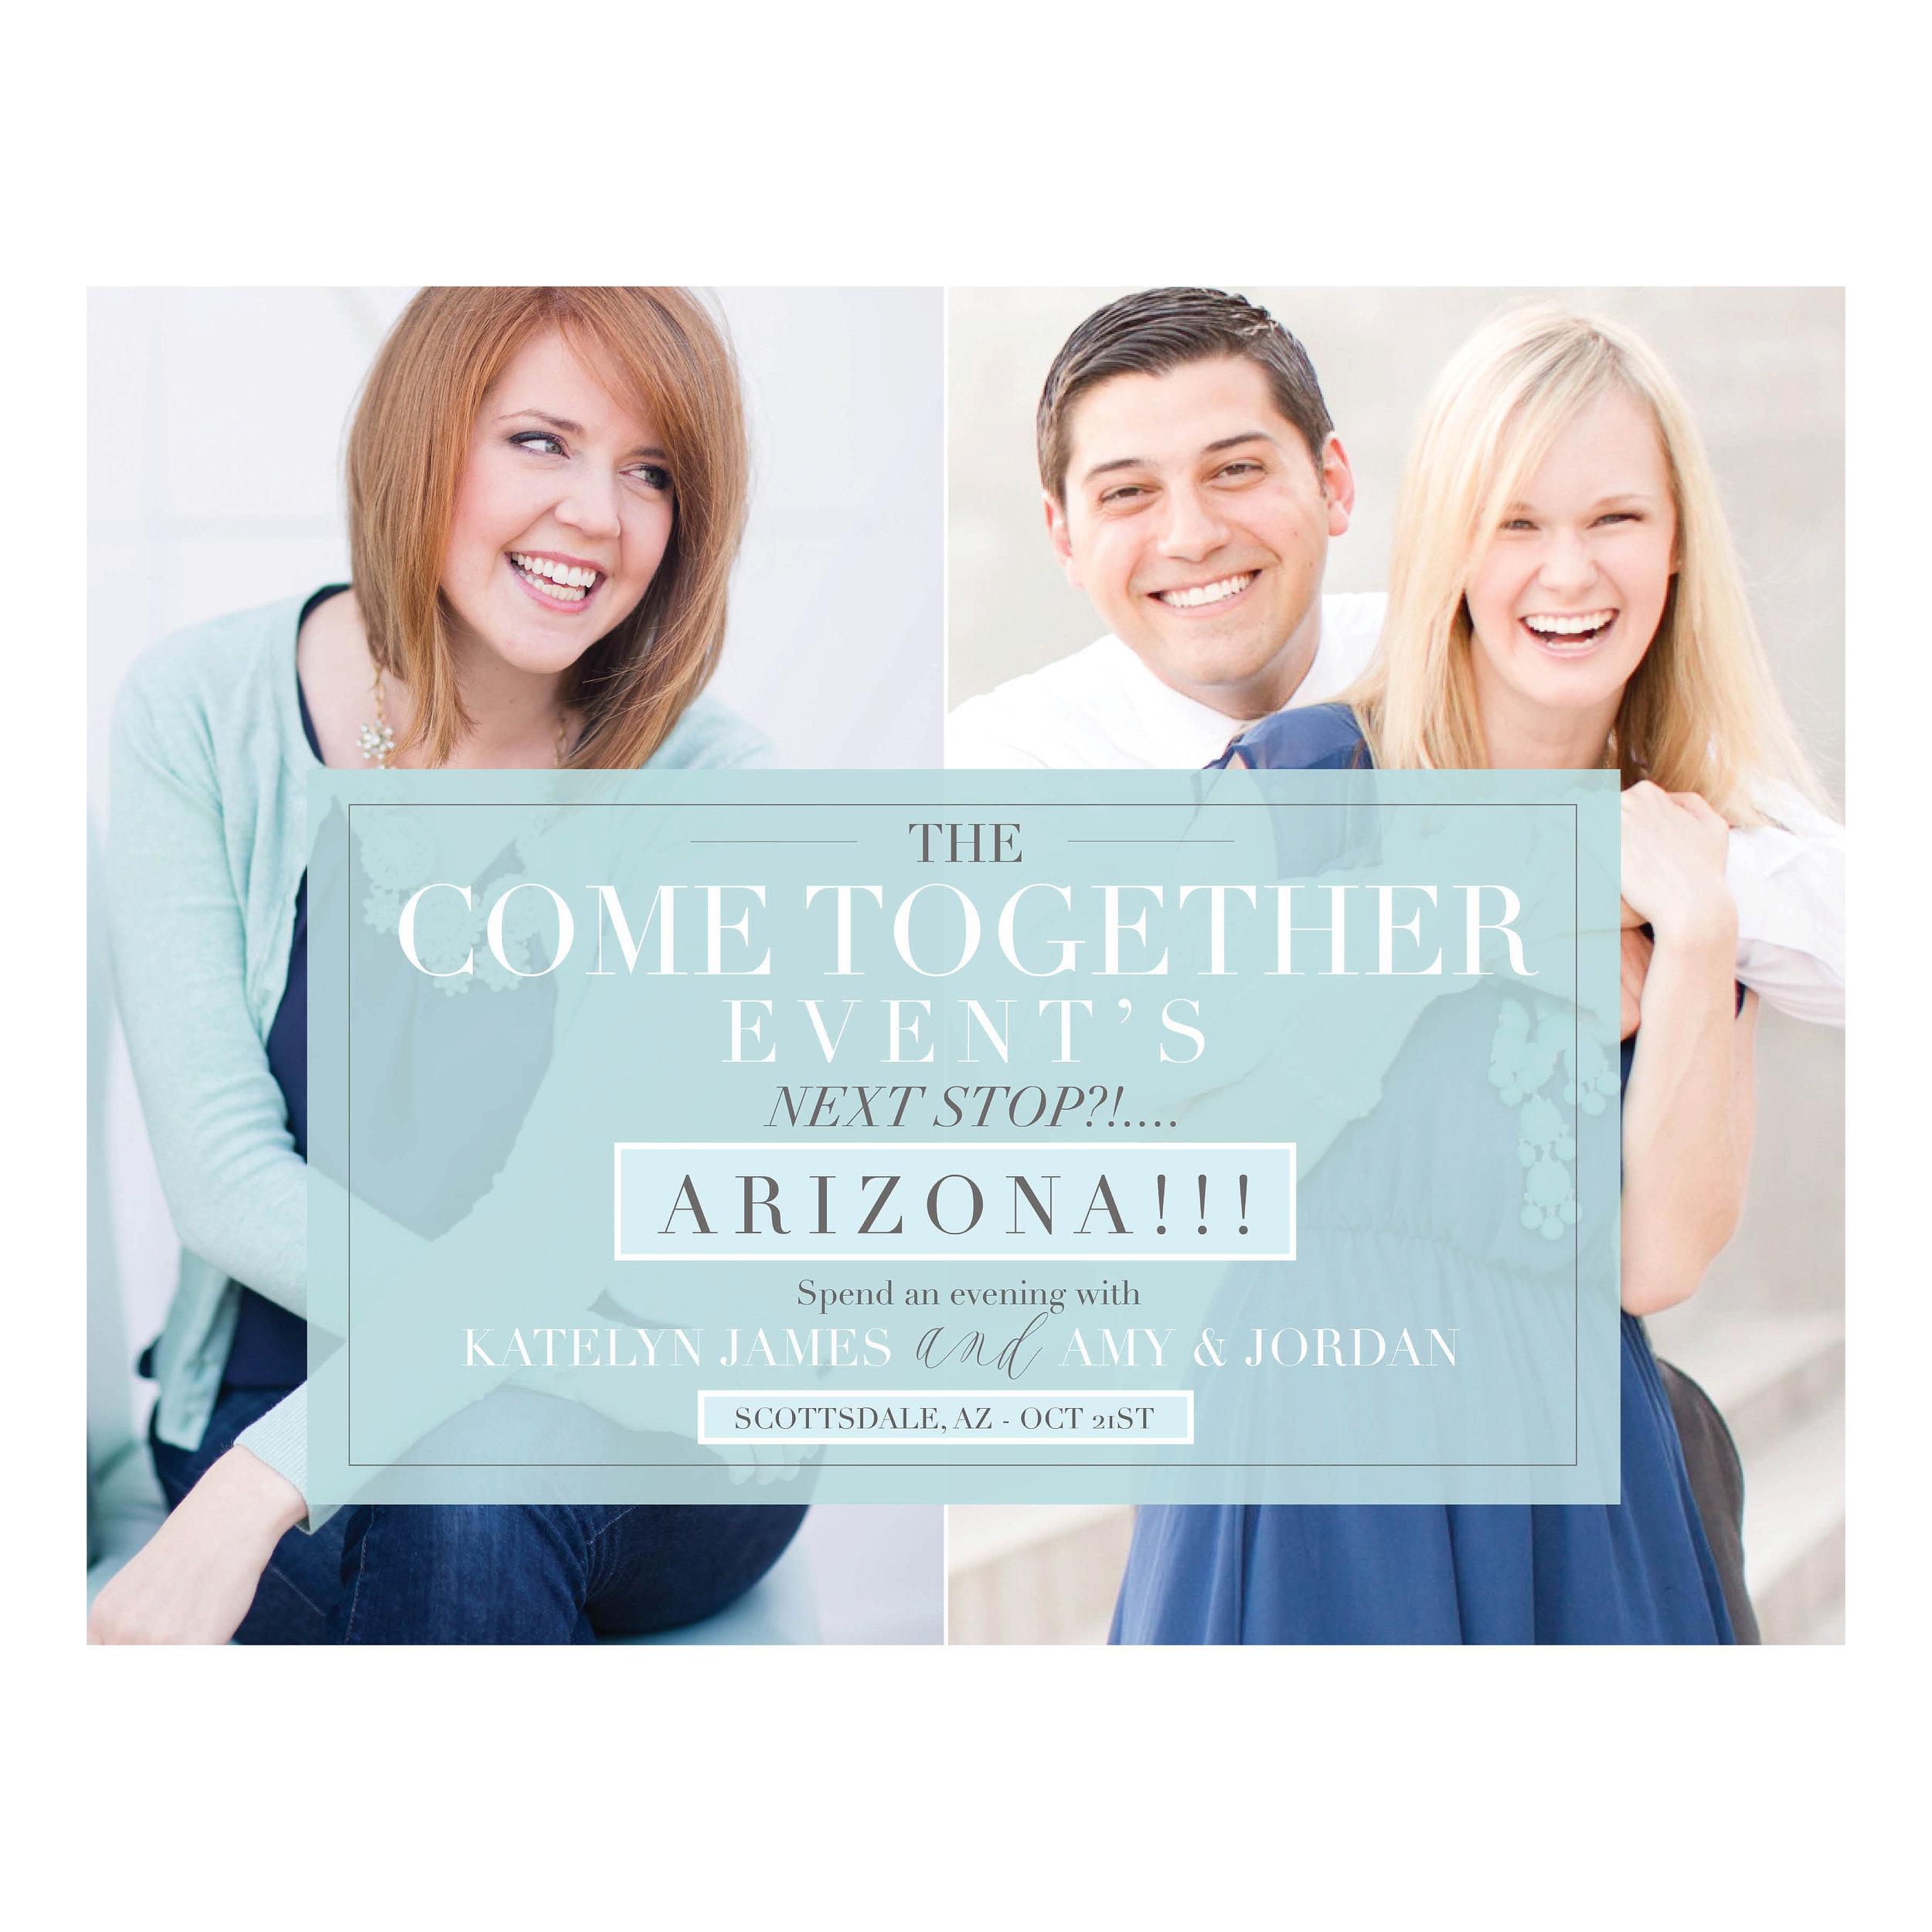 Come-Together-Arizona_2015.jpg